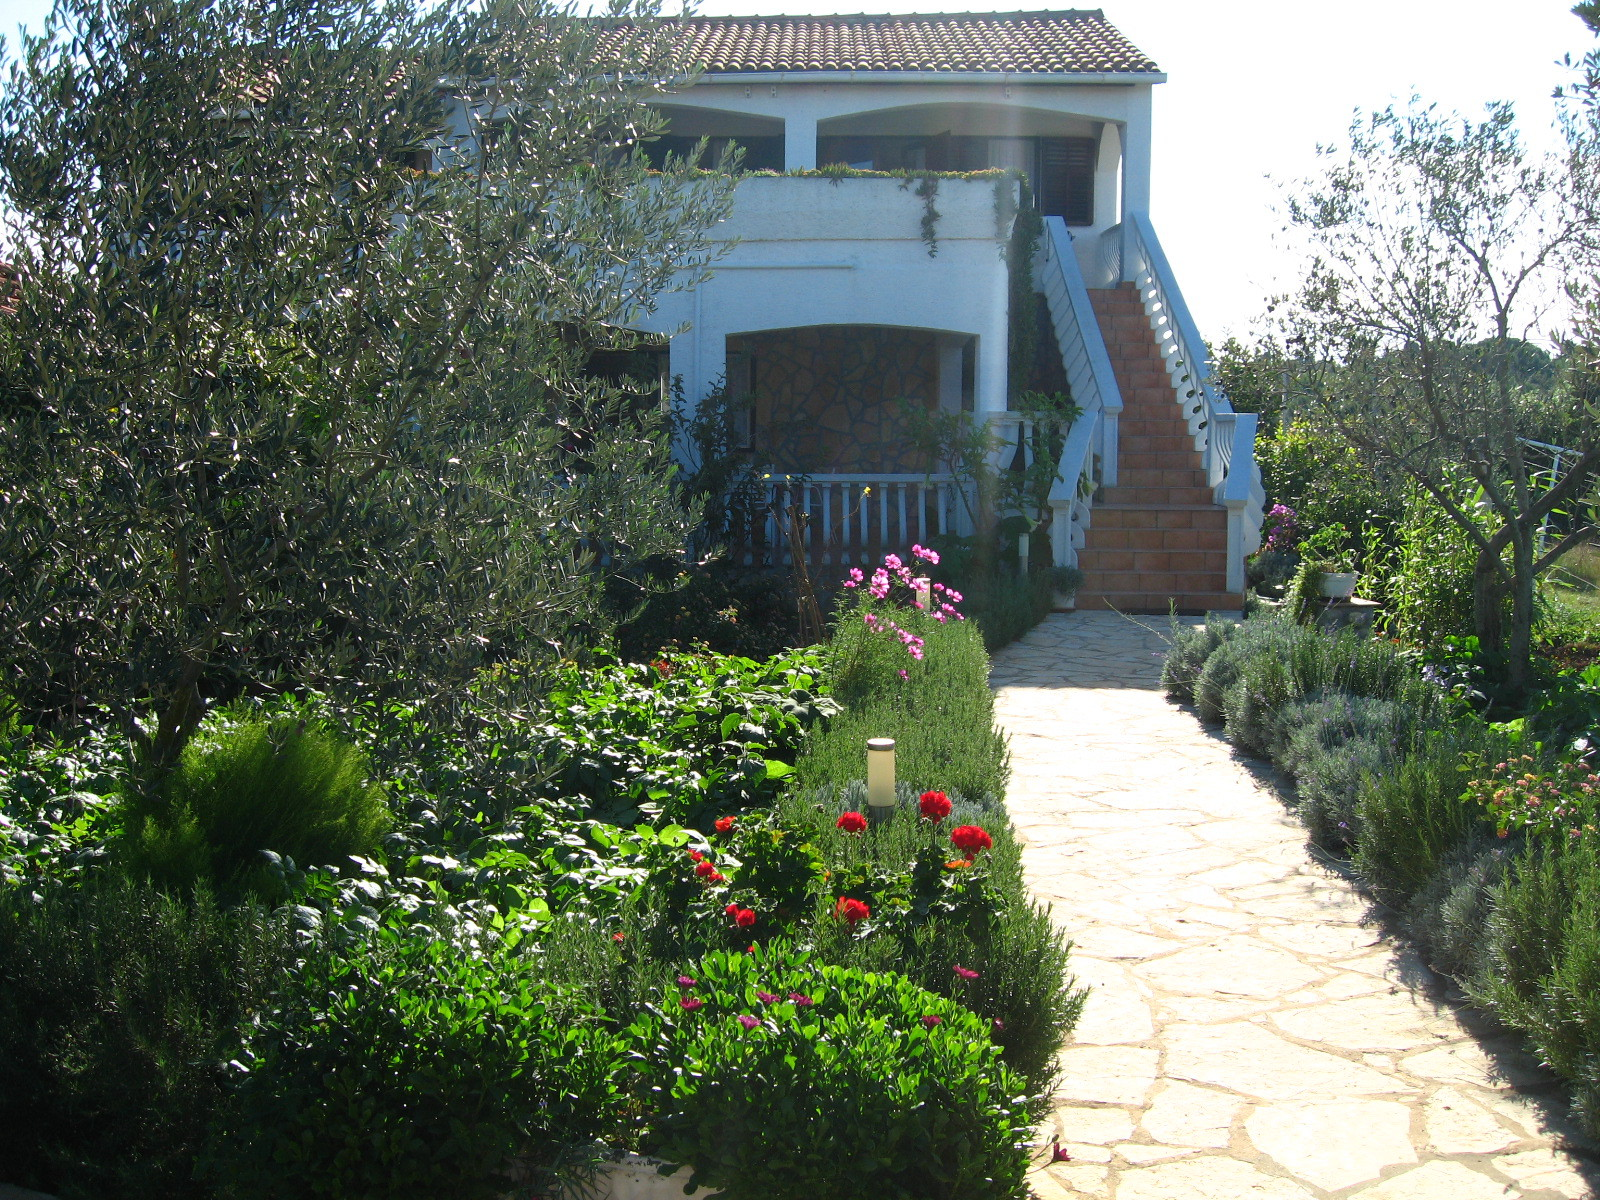 Ferienwohnung Lado SA1(2+1) - Muline (741846), Ugljan, Insel Ugljan, Dalmatien, Kroatien, Bild 2